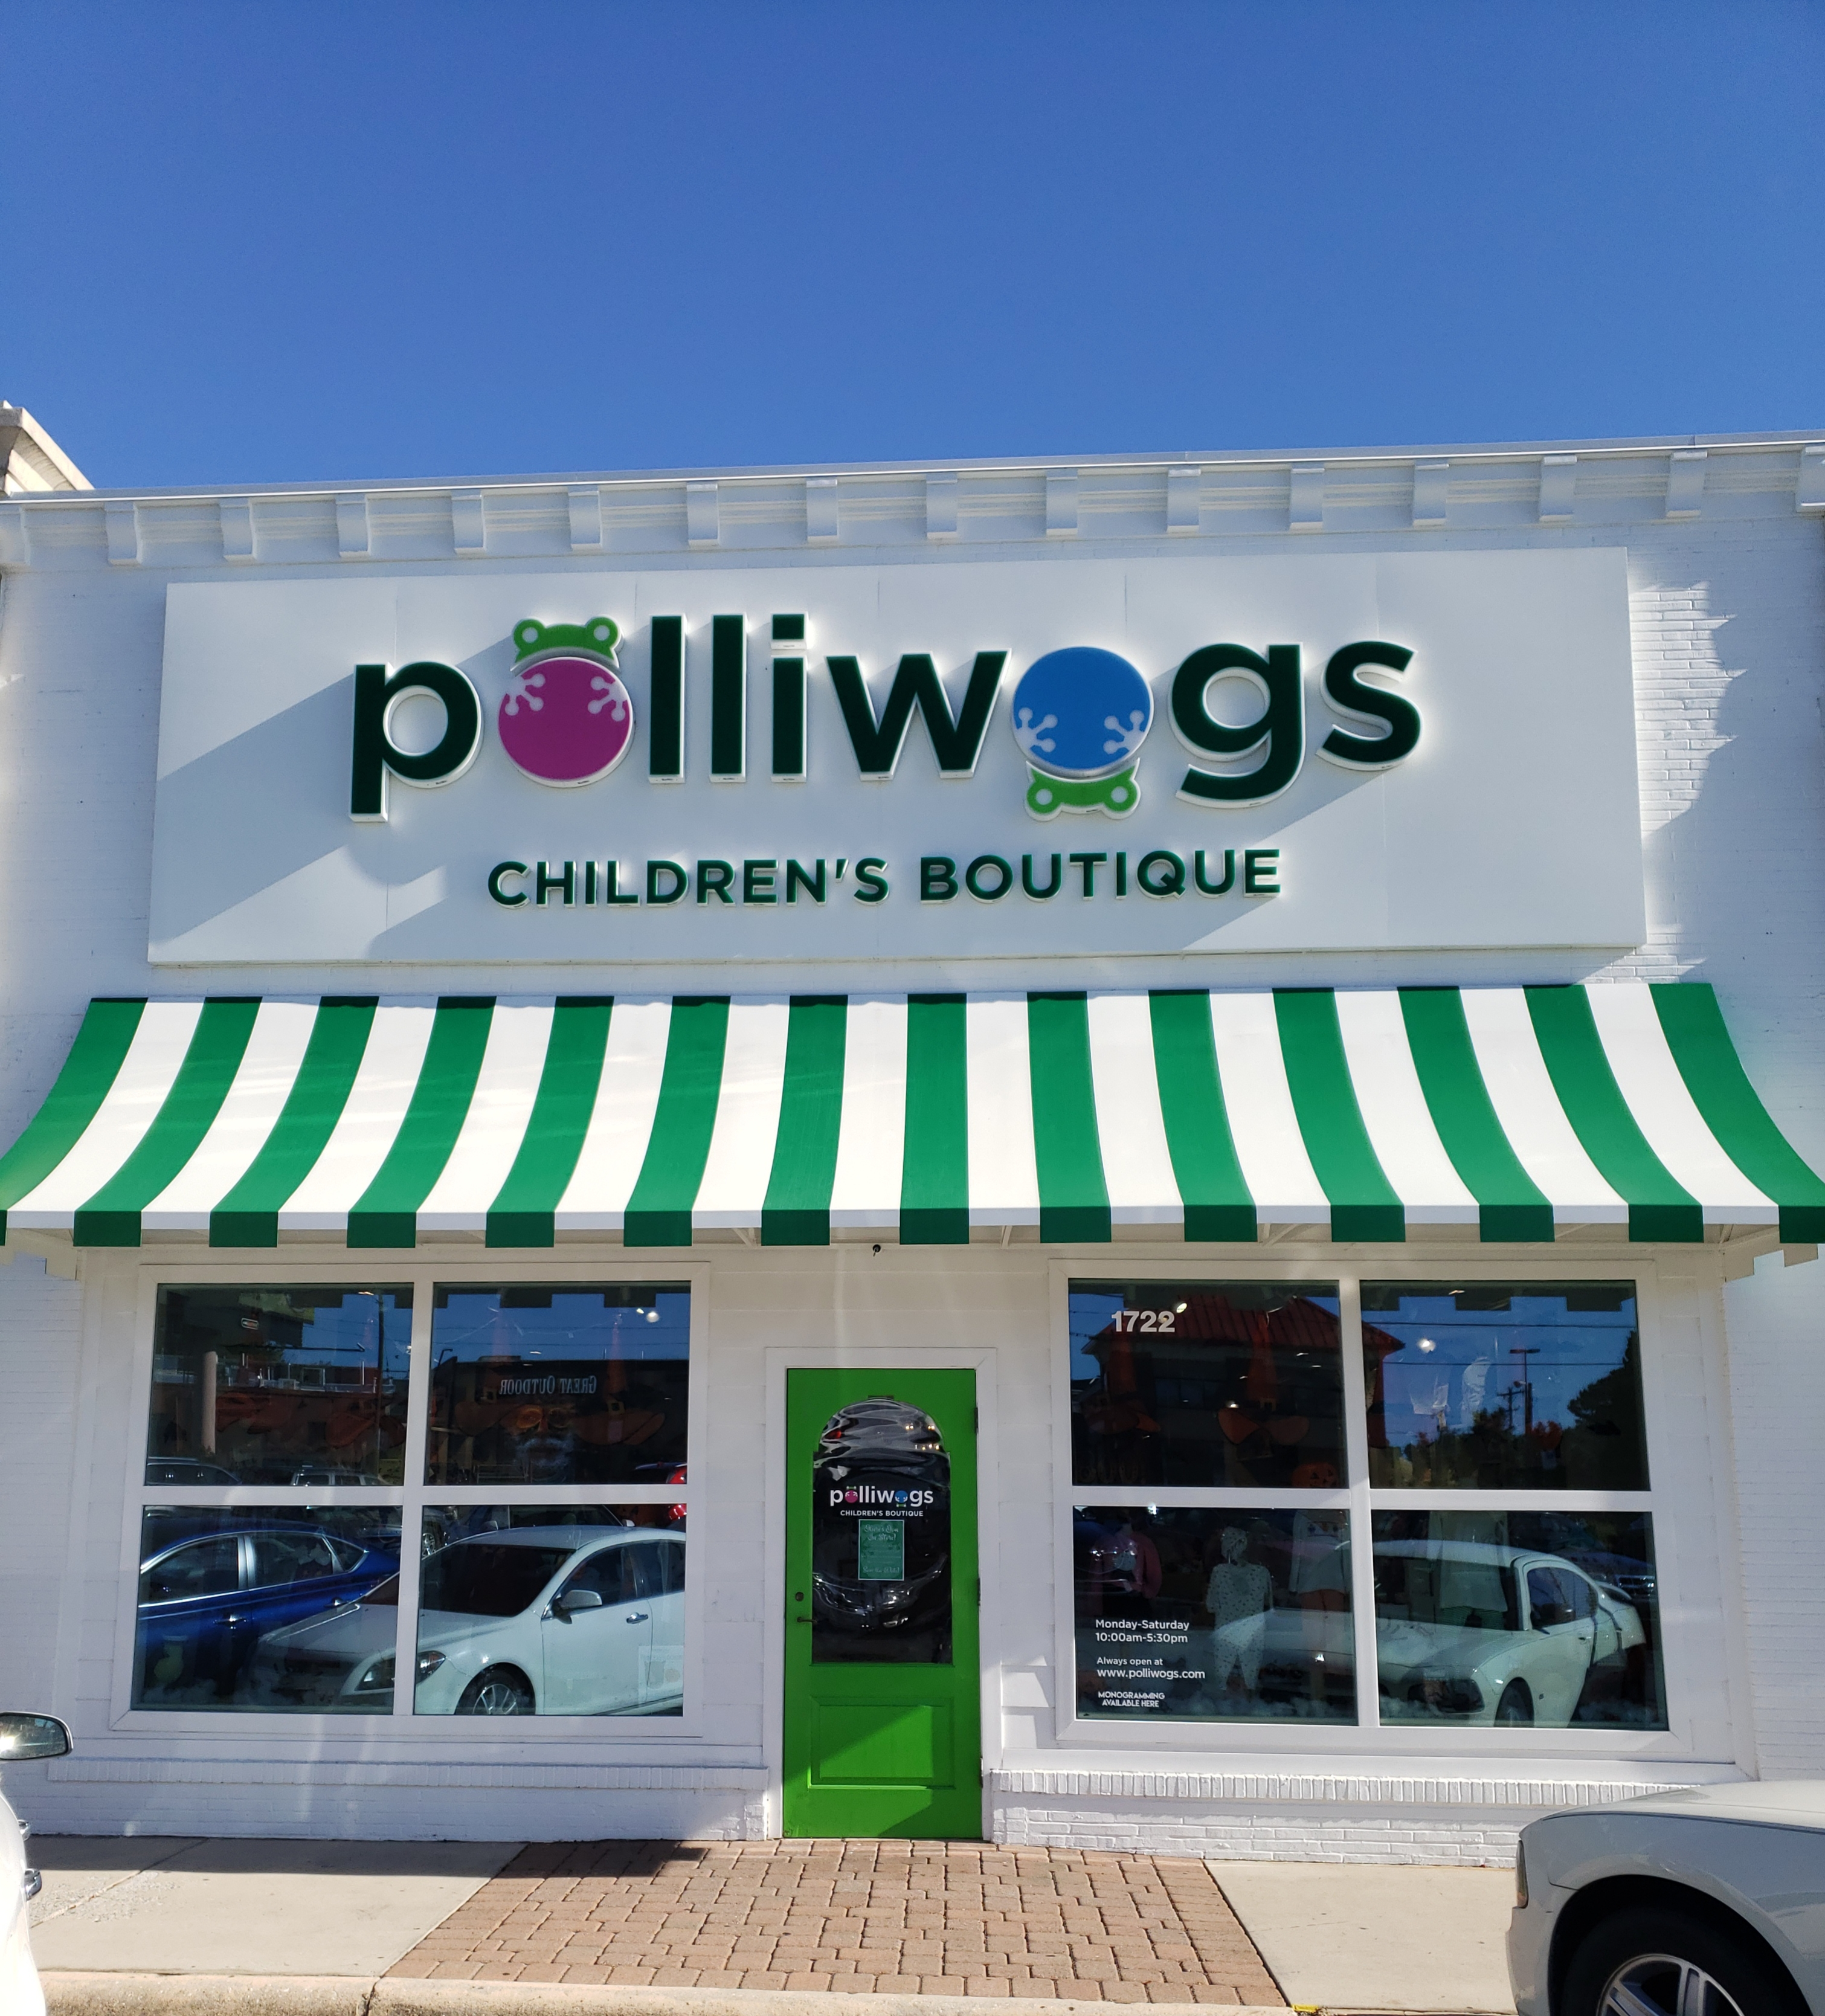 Polliwogs